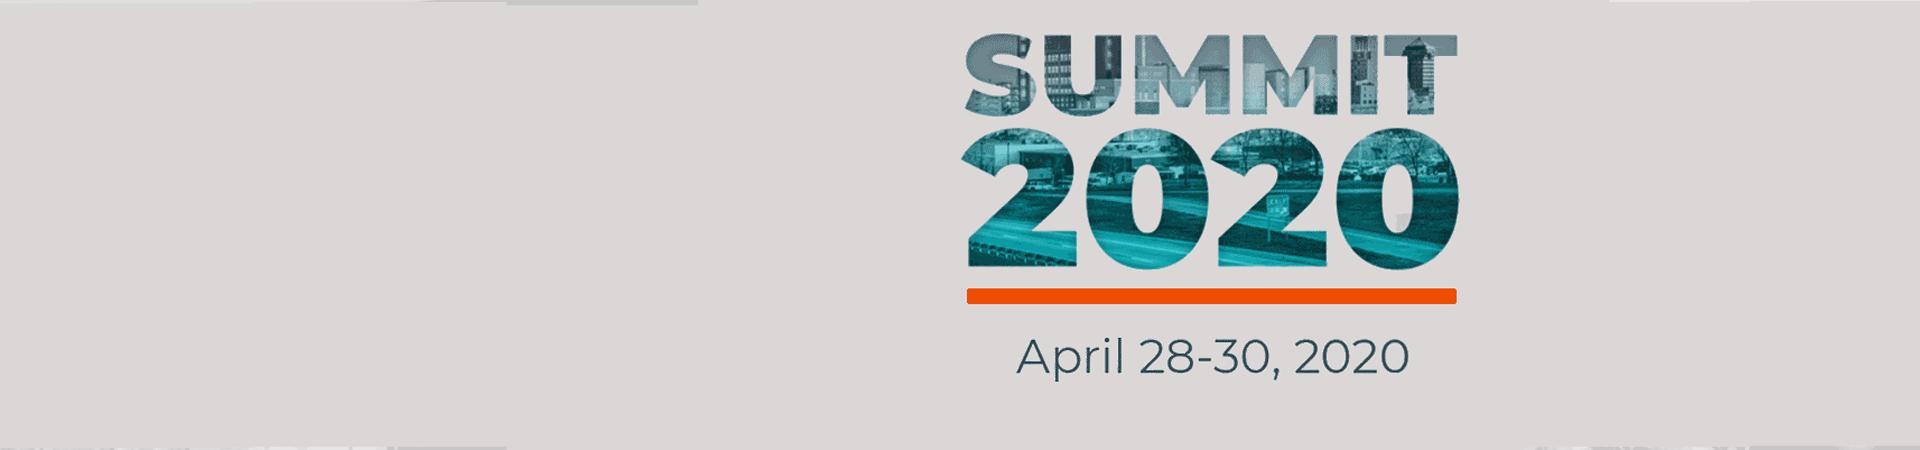 ARIS 2020 Summit April 28-30, 2020